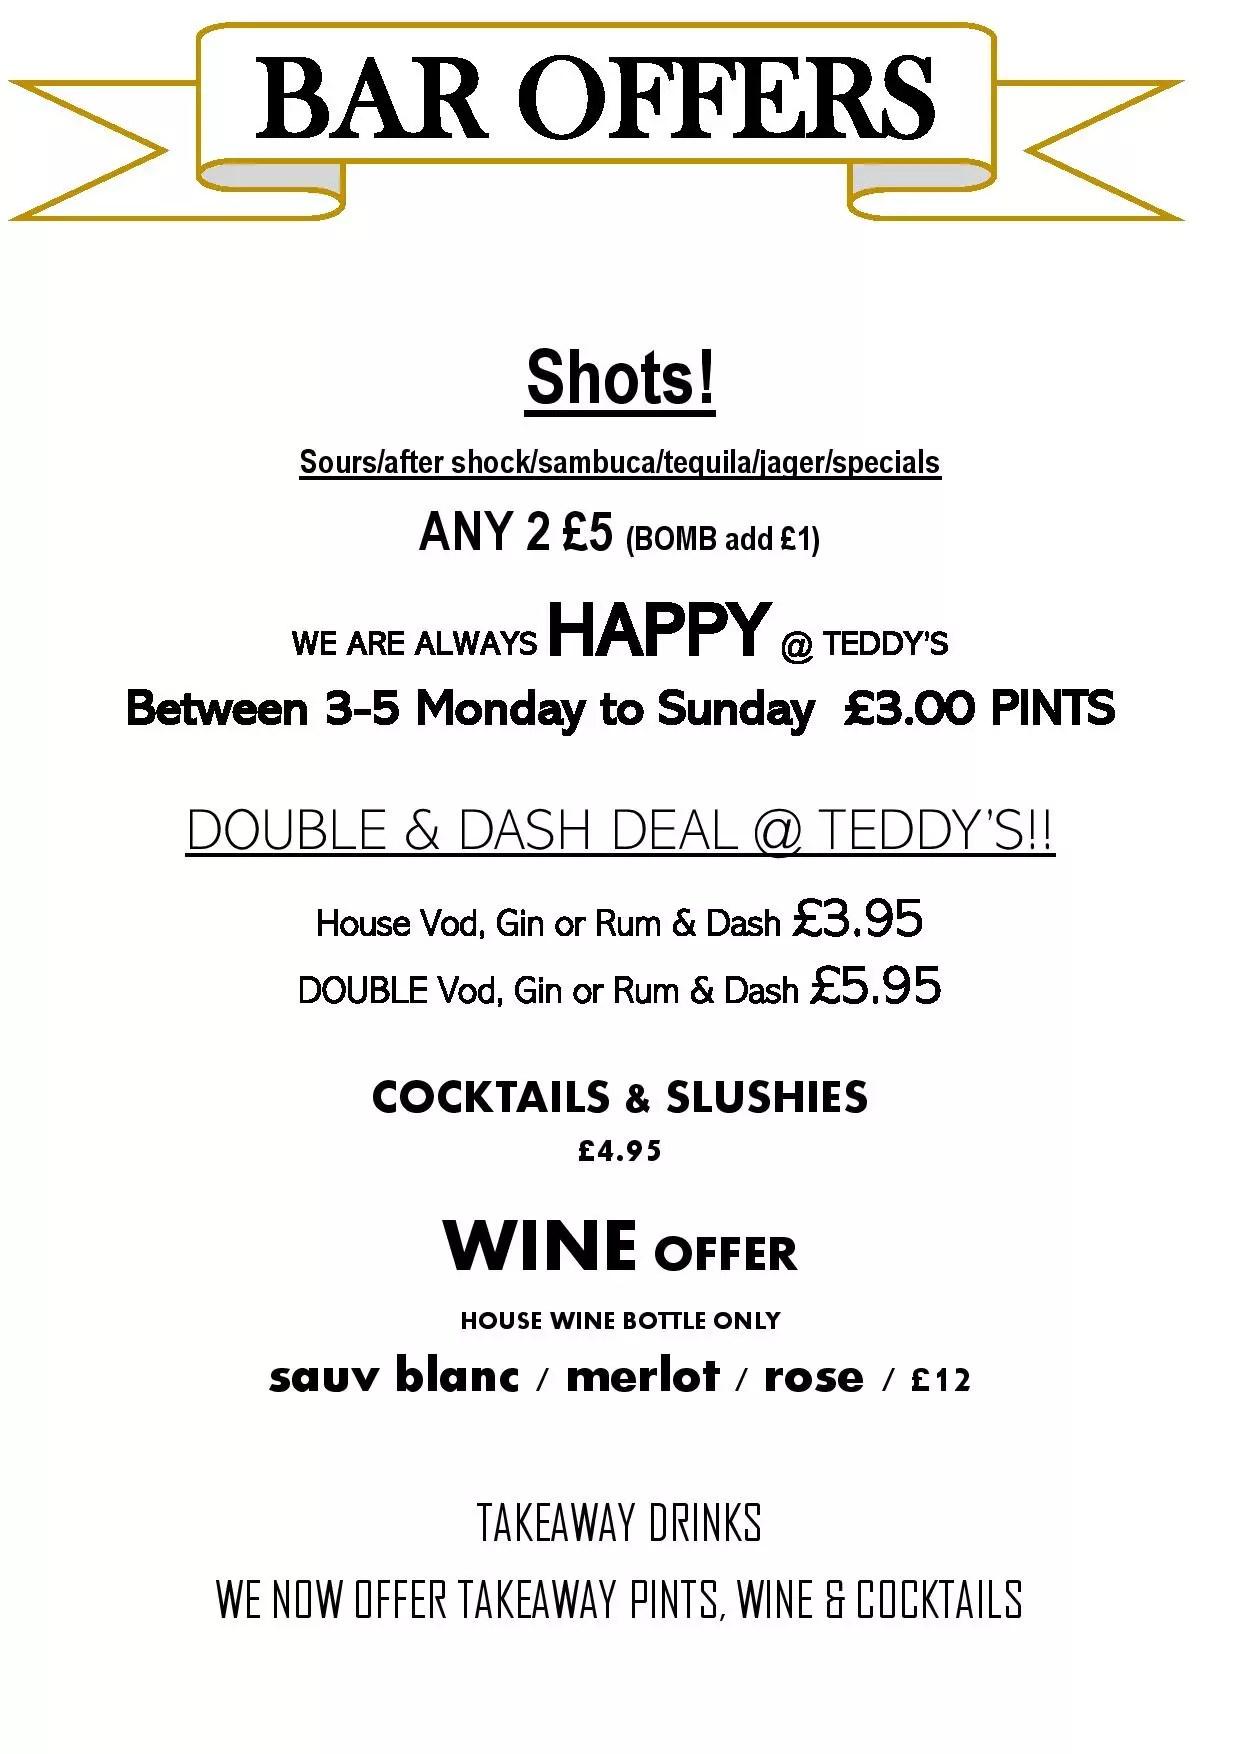 Teddys bar deals